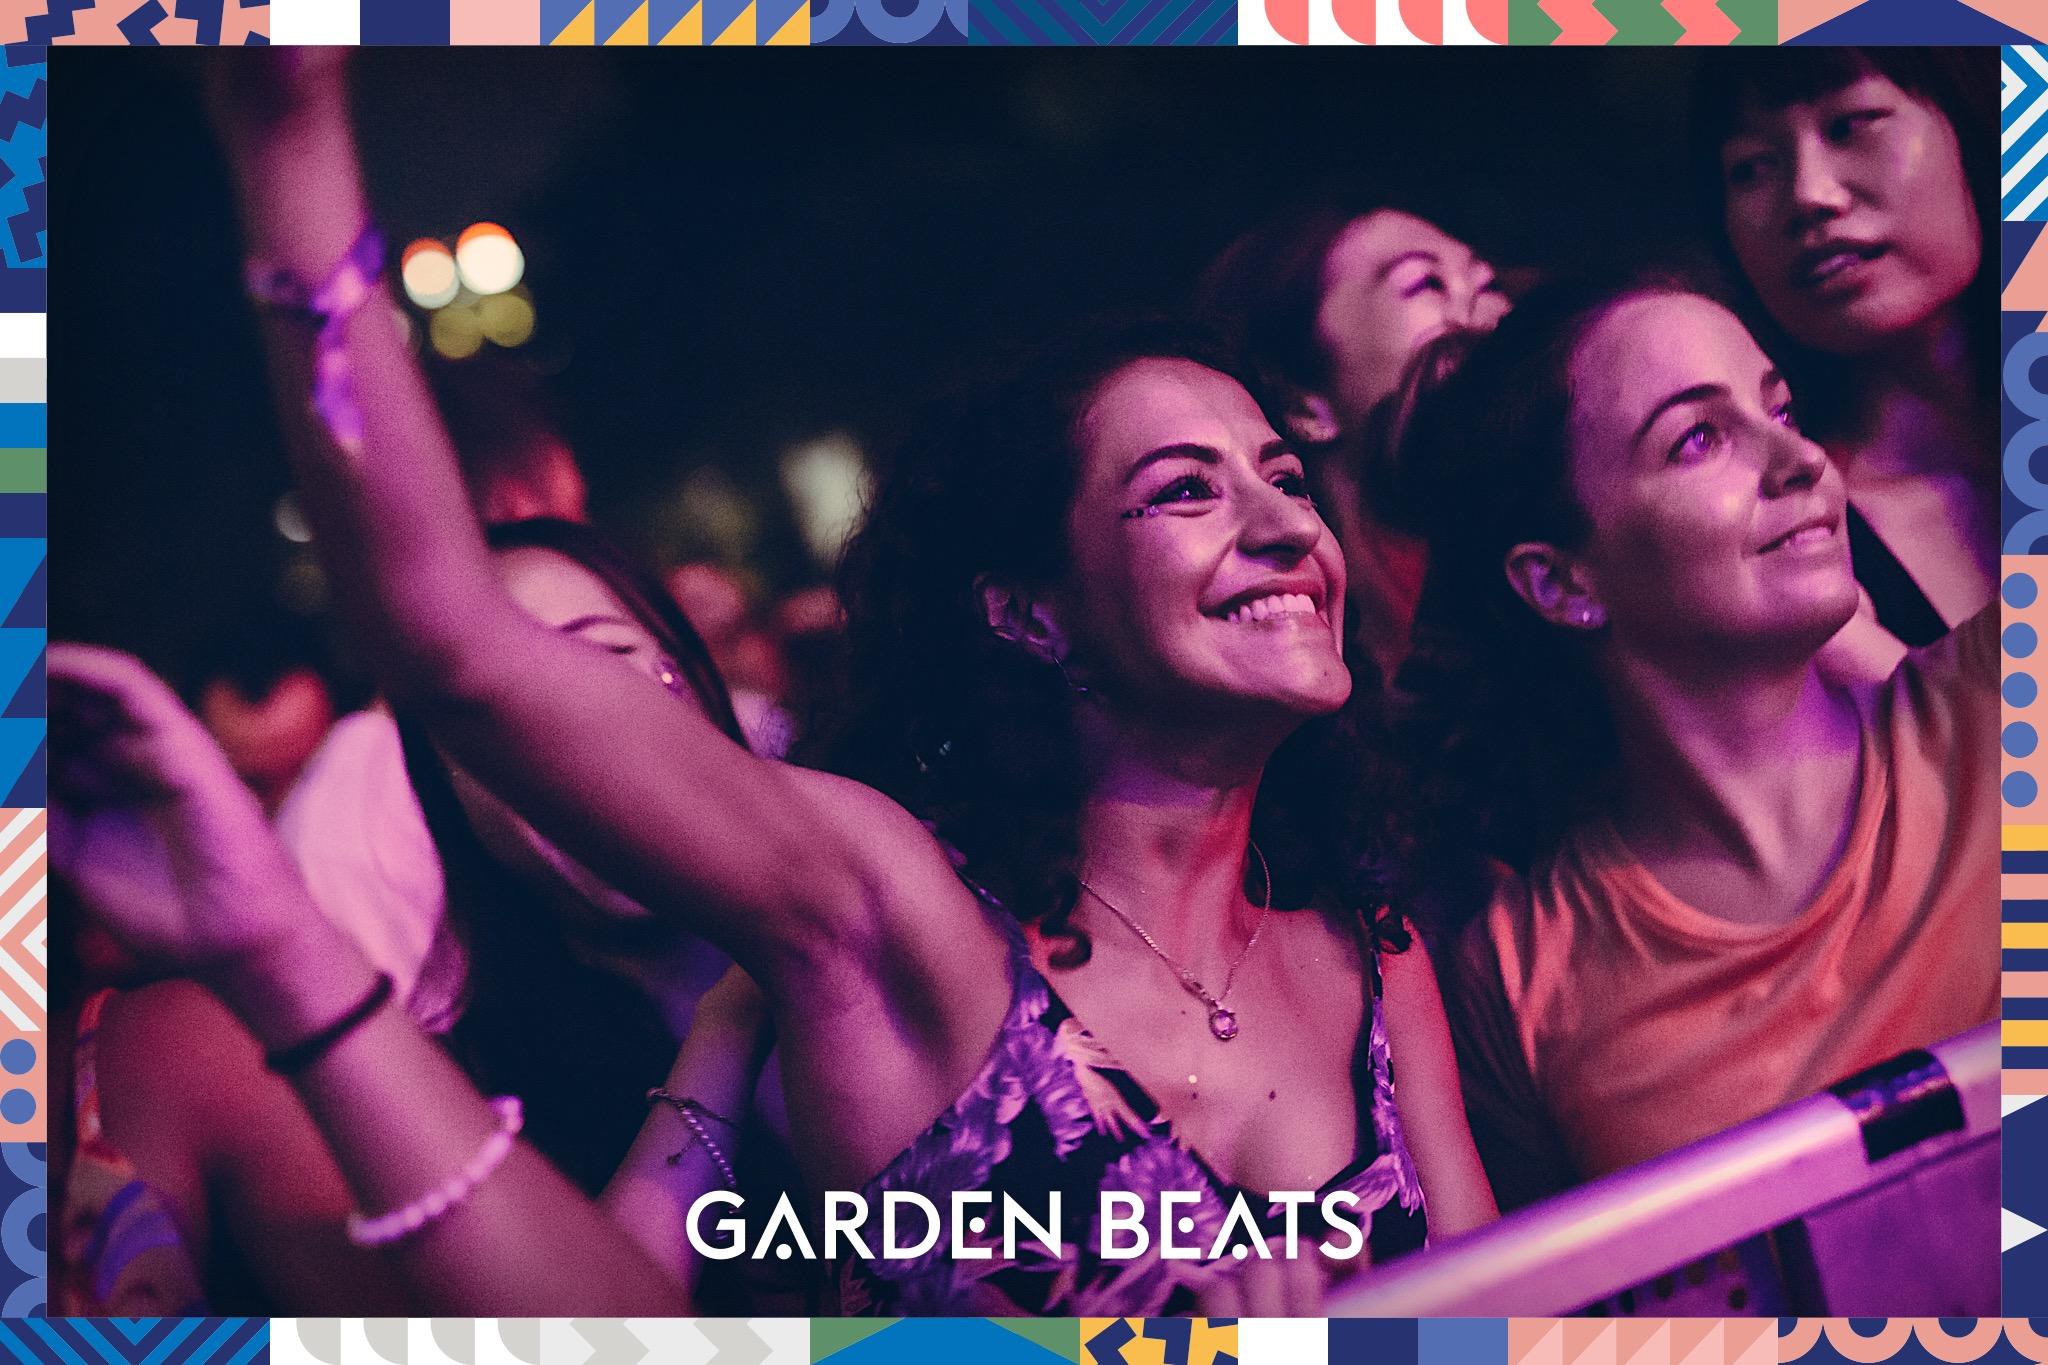 03032018_GardenBeats_Colossal958_Watermarked.jpg